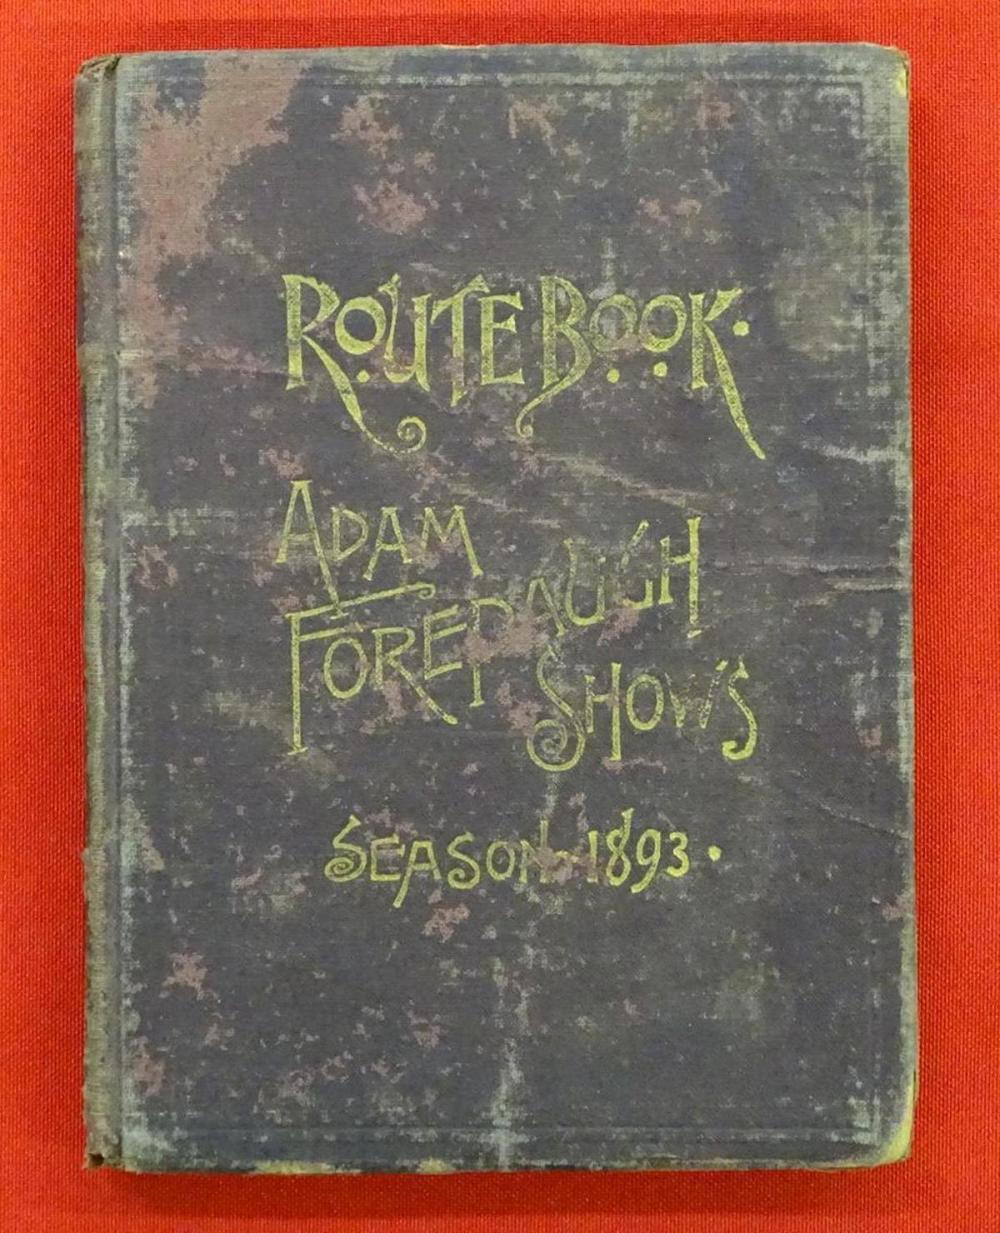 ADAM FOREPAUGH SHOWS ROUTE BOOK - 1893